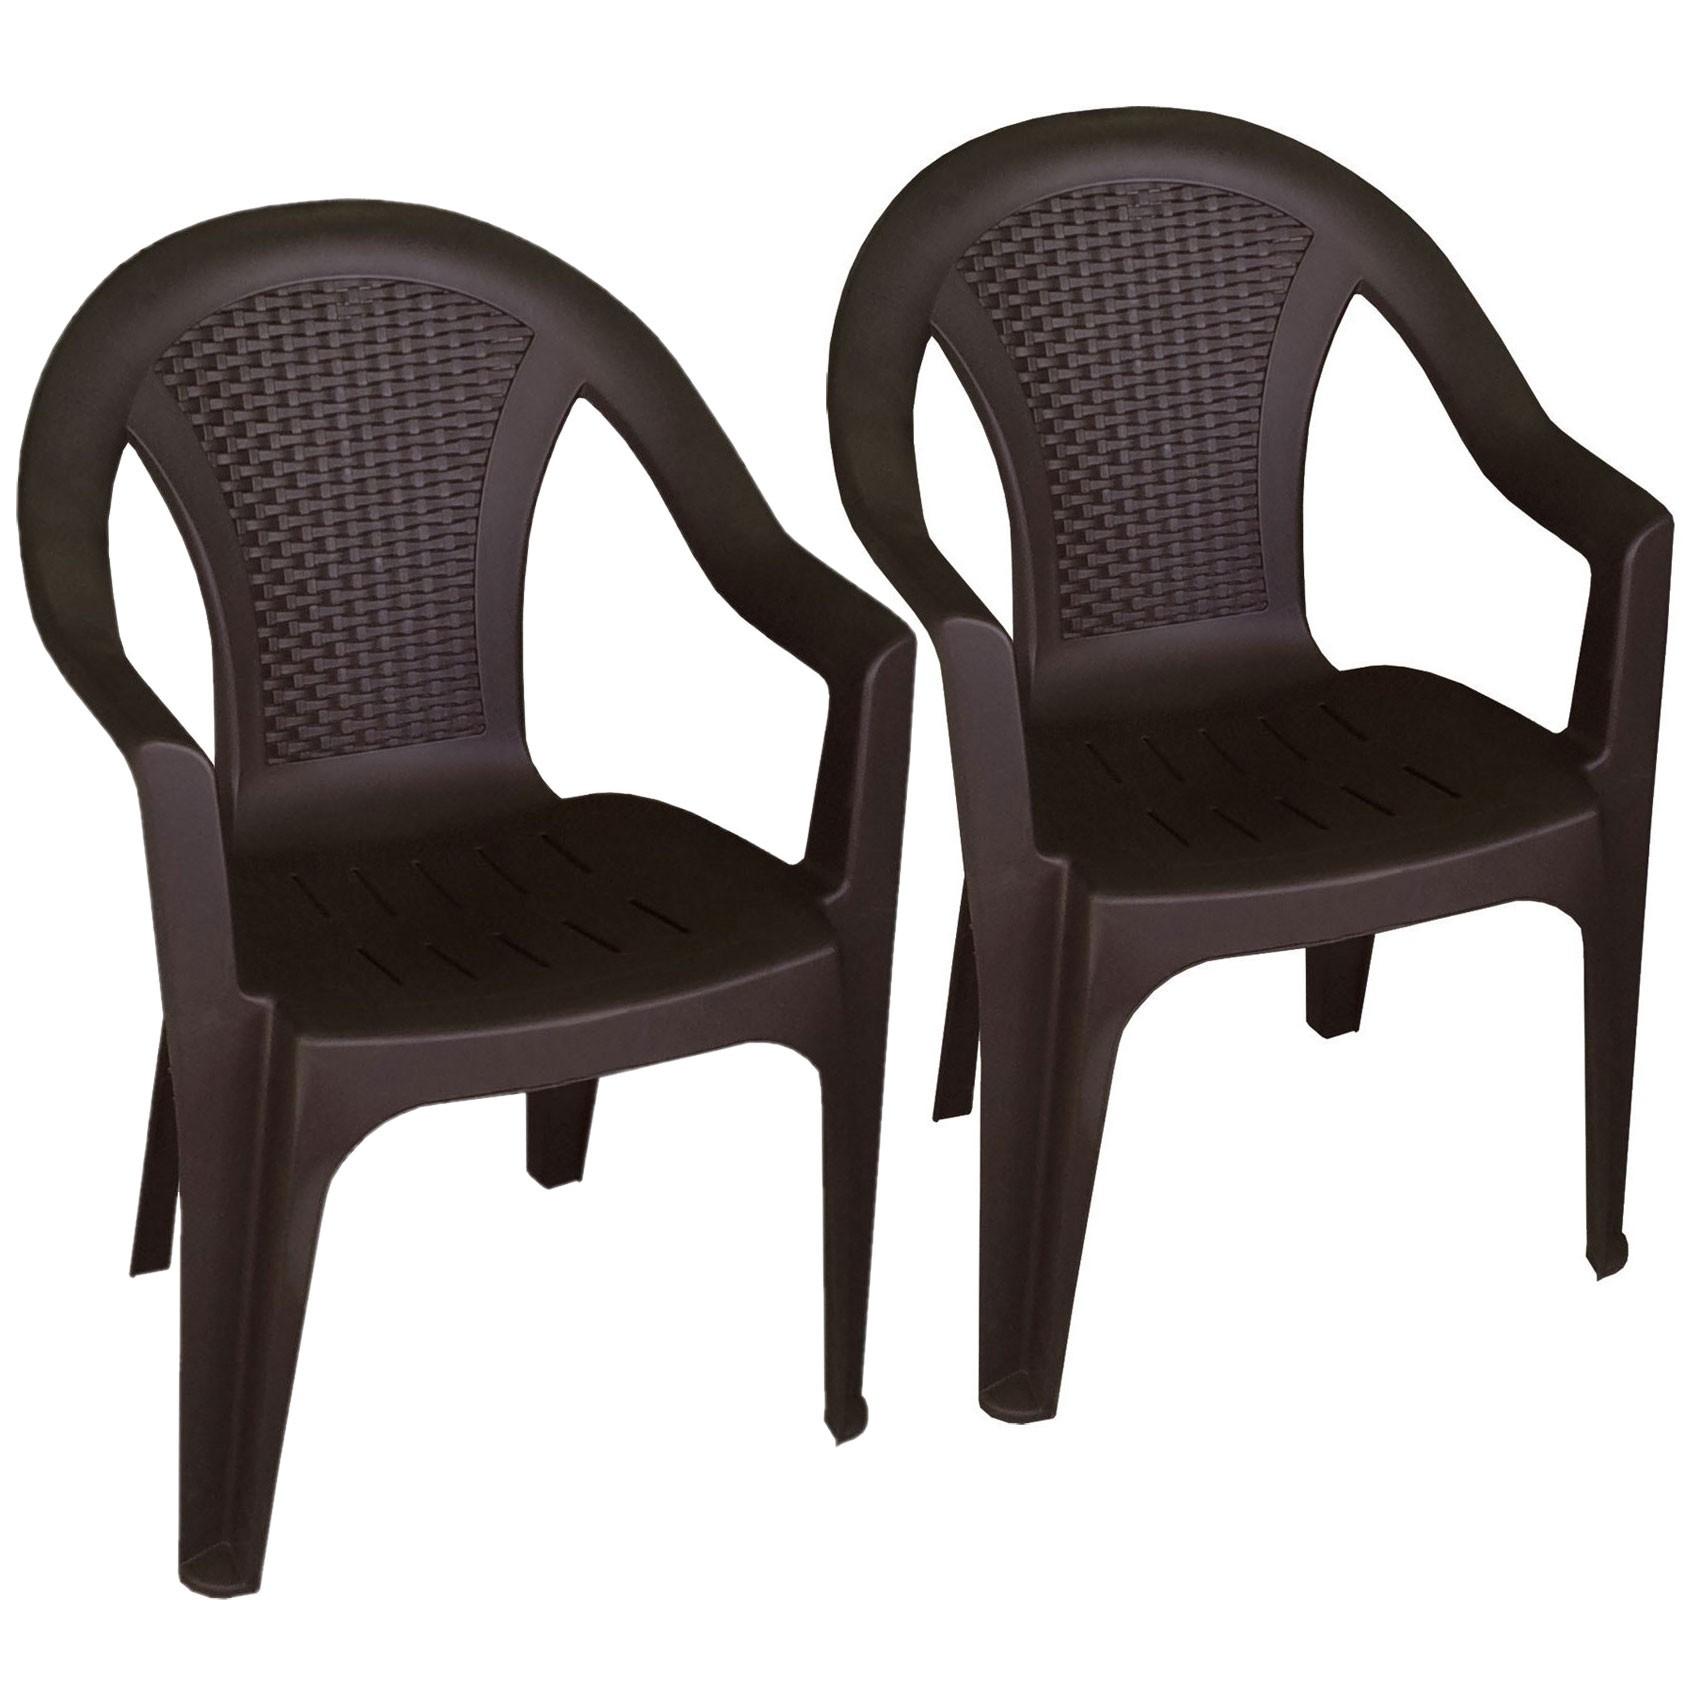 2 st ck stapelstuhl ischia mokka garten gartenm bel. Black Bedroom Furniture Sets. Home Design Ideas